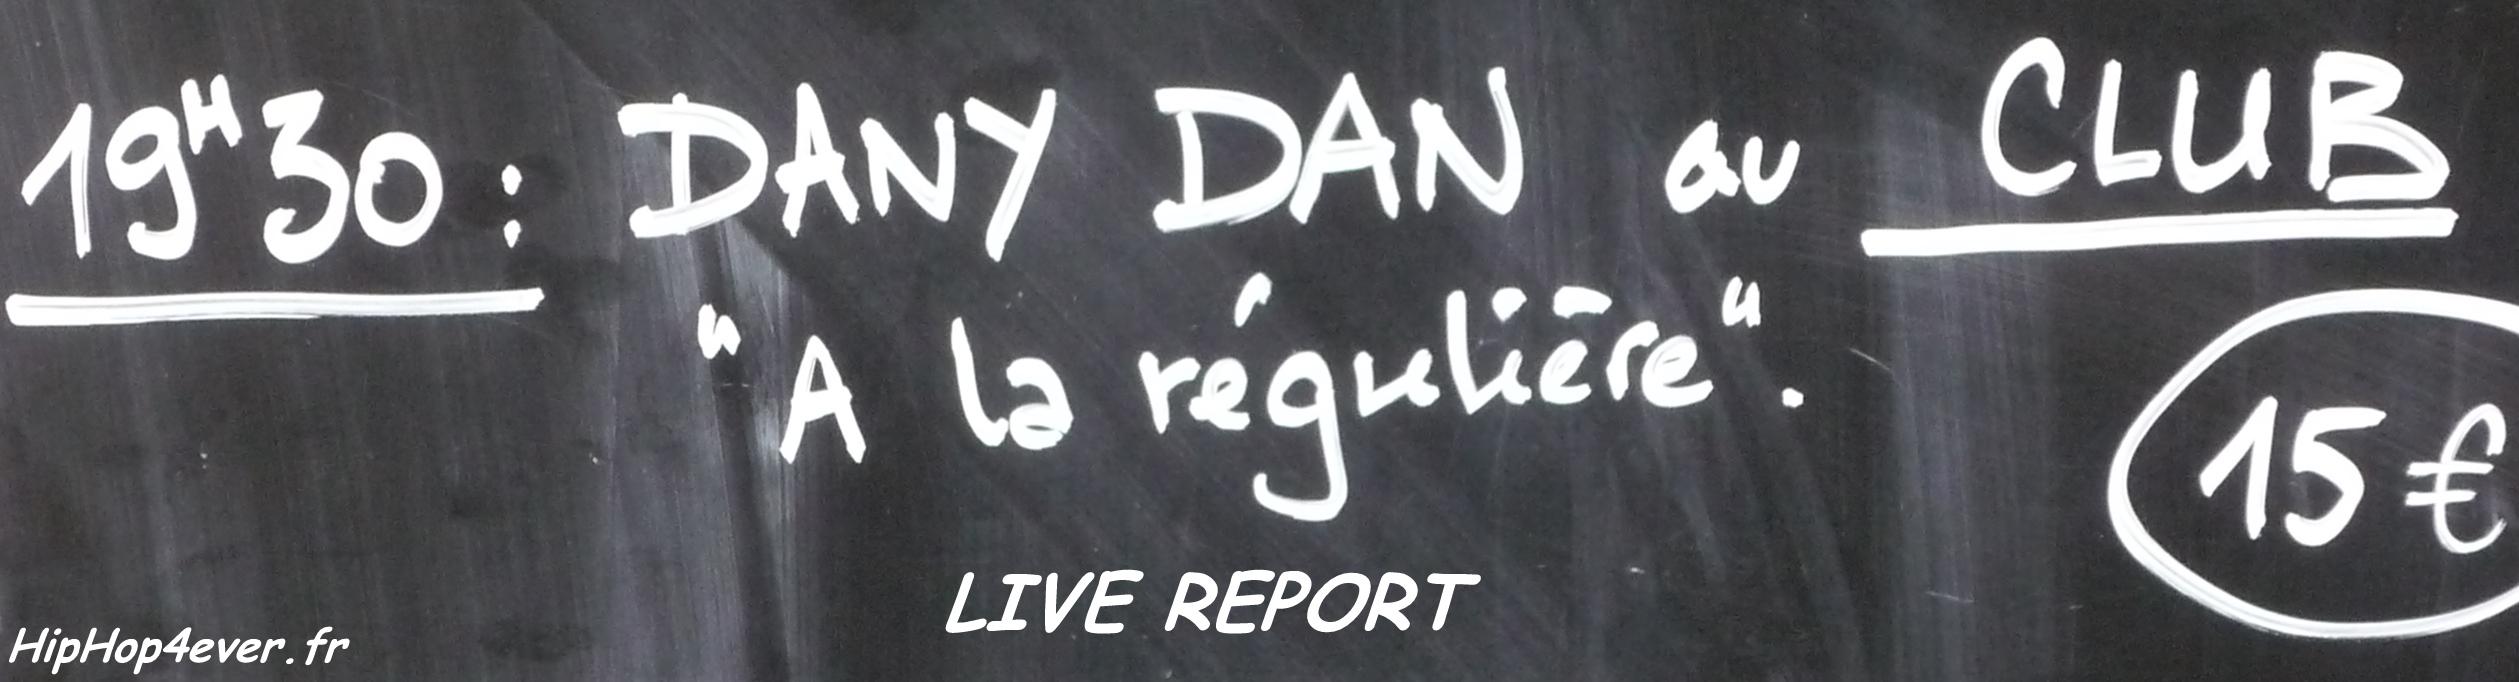 dany-dan-livereport